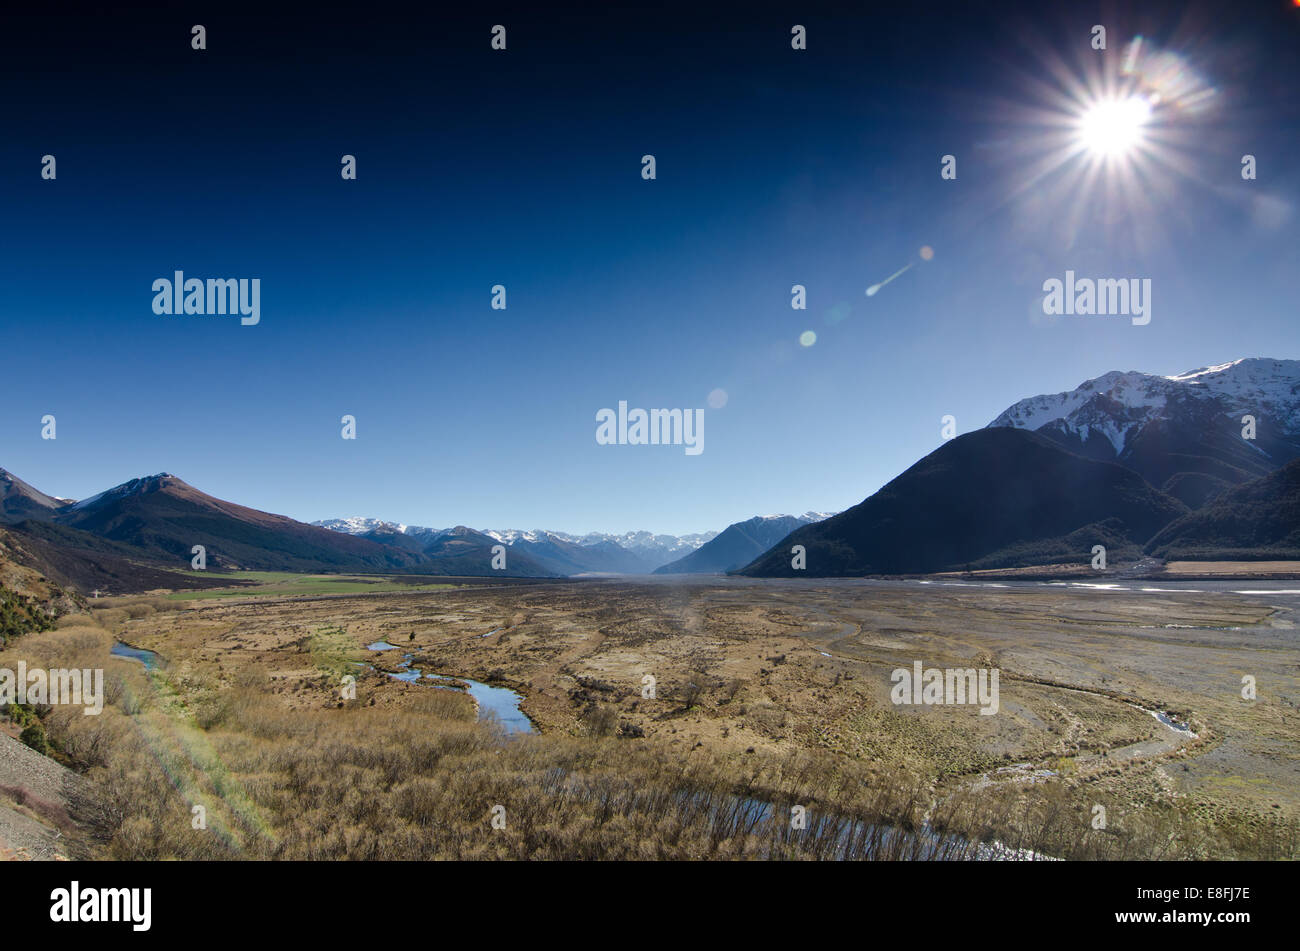 New Zealand, Canterbury, Arthur's Pass, Plains under sunlight - Stock Image